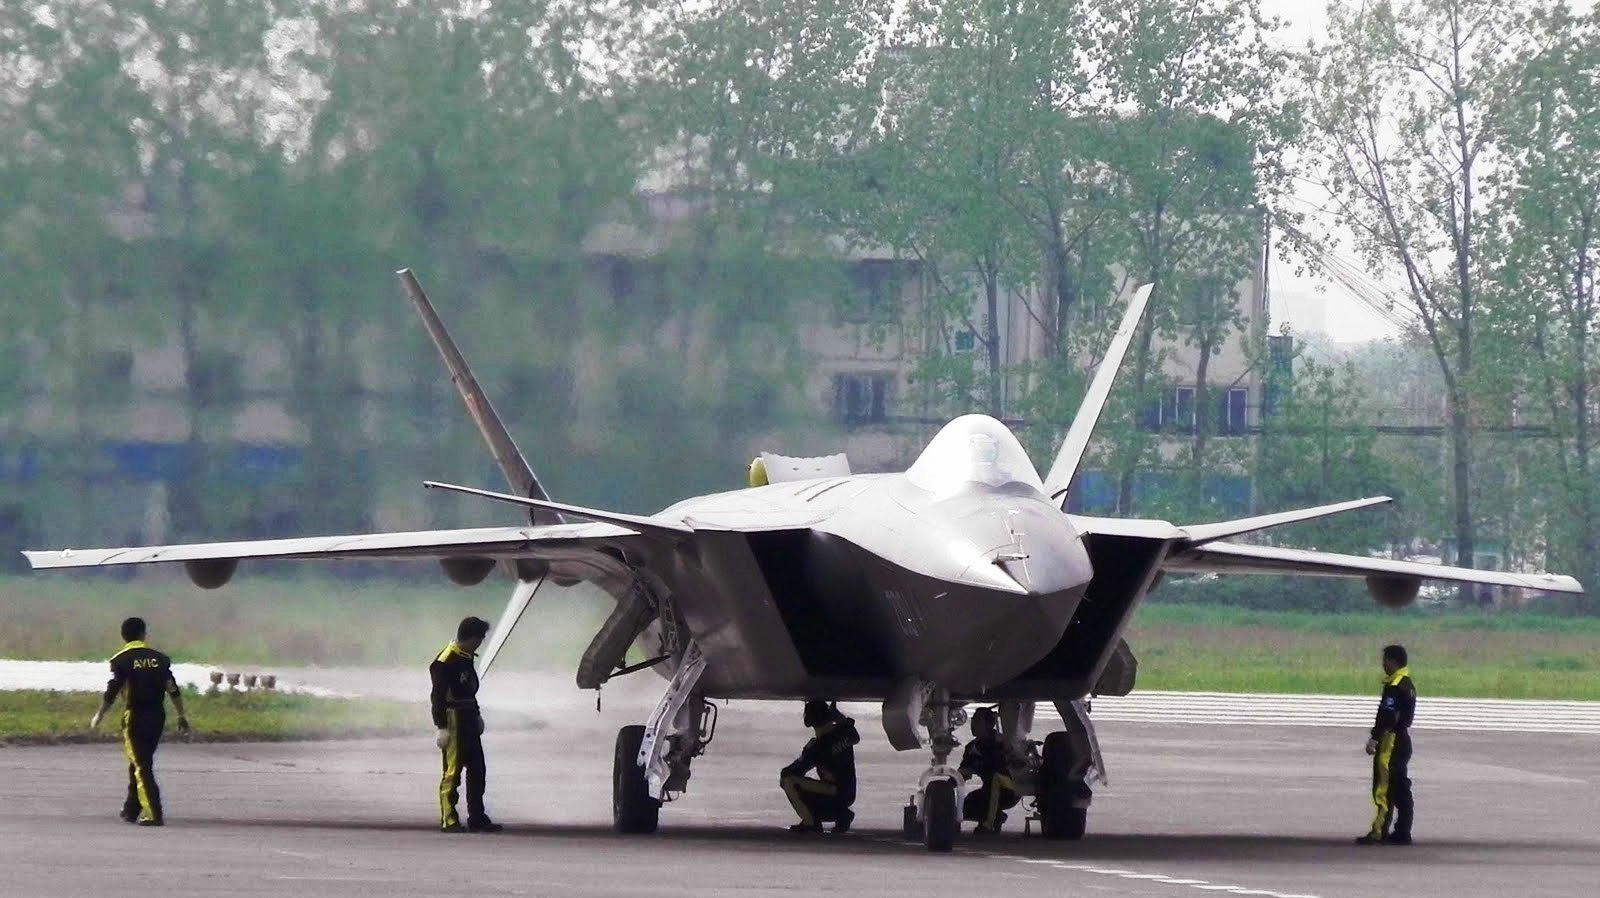 http://3.bp.blogspot.com/-aWFrDtvMjCQ/Tiodg6CY67I/AAAAAAAAGAo/5kxN39ARD_Y/s1600/chengdu_j_20_the_mighty_chinese_dragon_jet_fighter_412947_aircraft-wallpaper.jpg